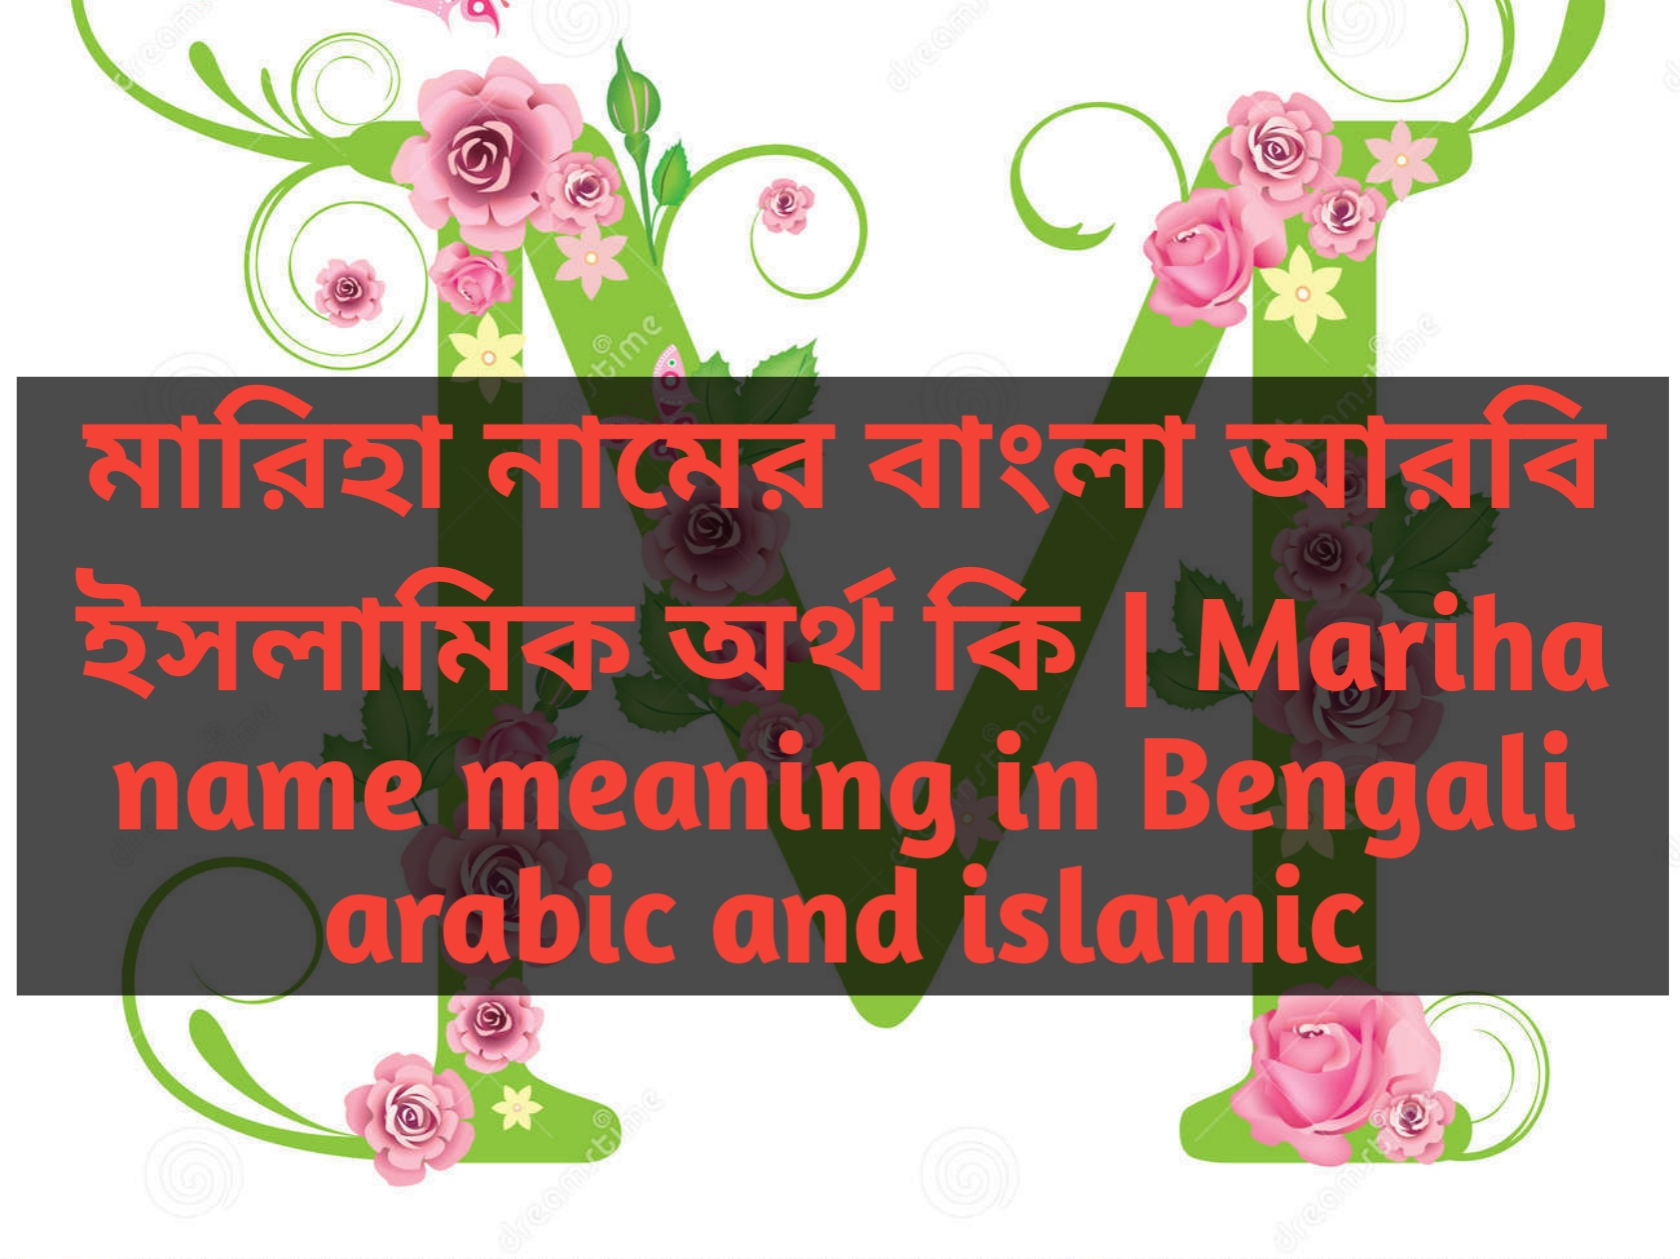 Mariha name meaning in Bengali, মারিহা নামের অর্থ কি, মারিহা নামের বাংলা অর্থ কি, মারিহা নামের ইসলামিক অর্থ কি,